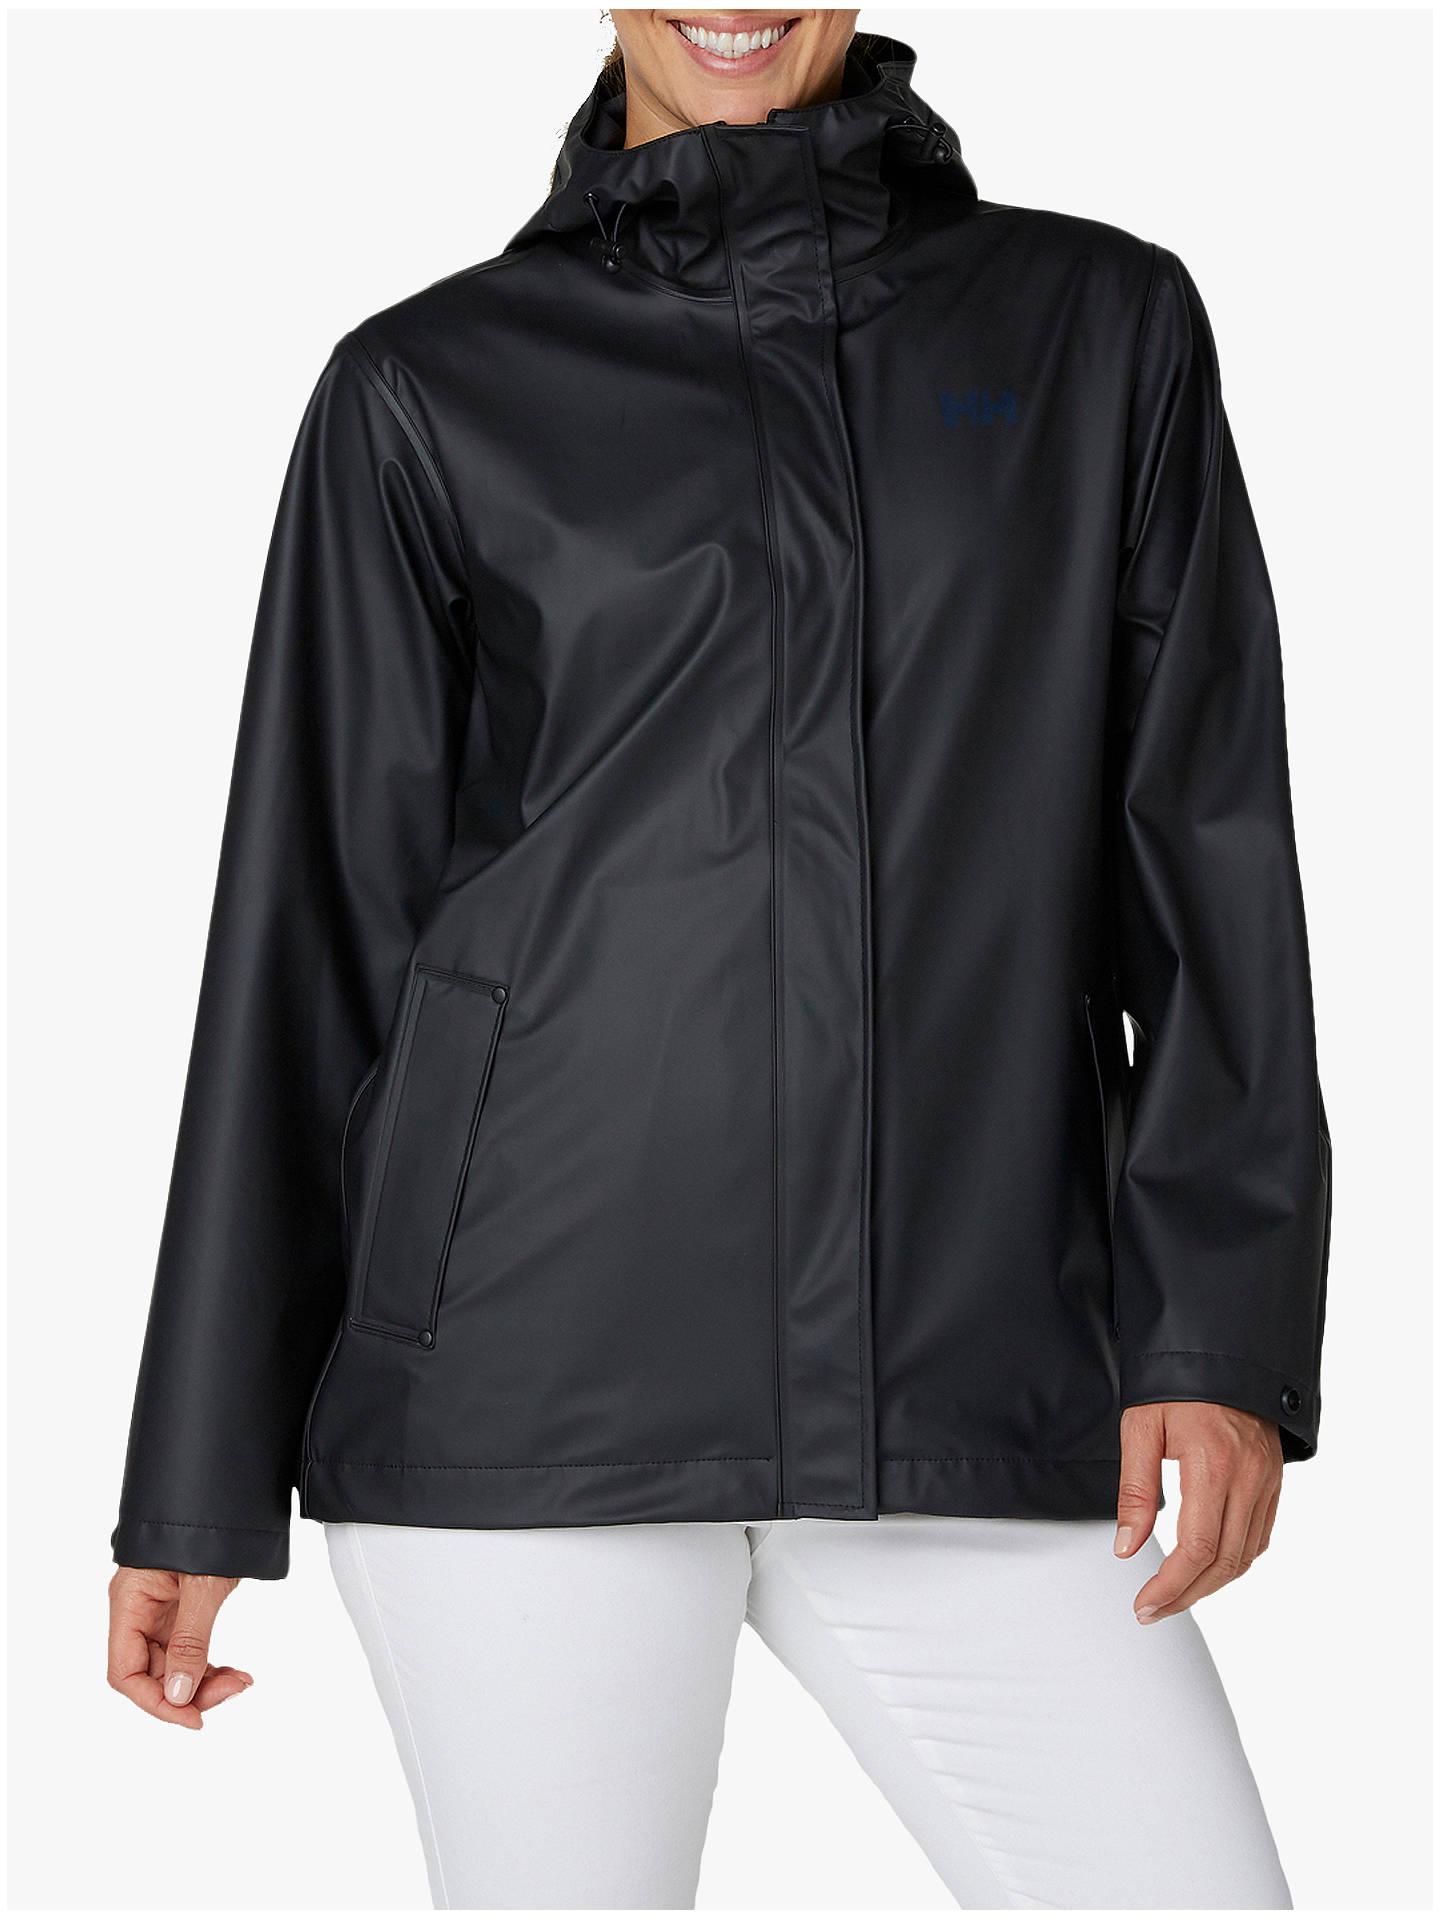 282649e4 Buy Helly Hansen Moss Women's Windproof Jacket, Black, XL Online at  johnlewis. ...